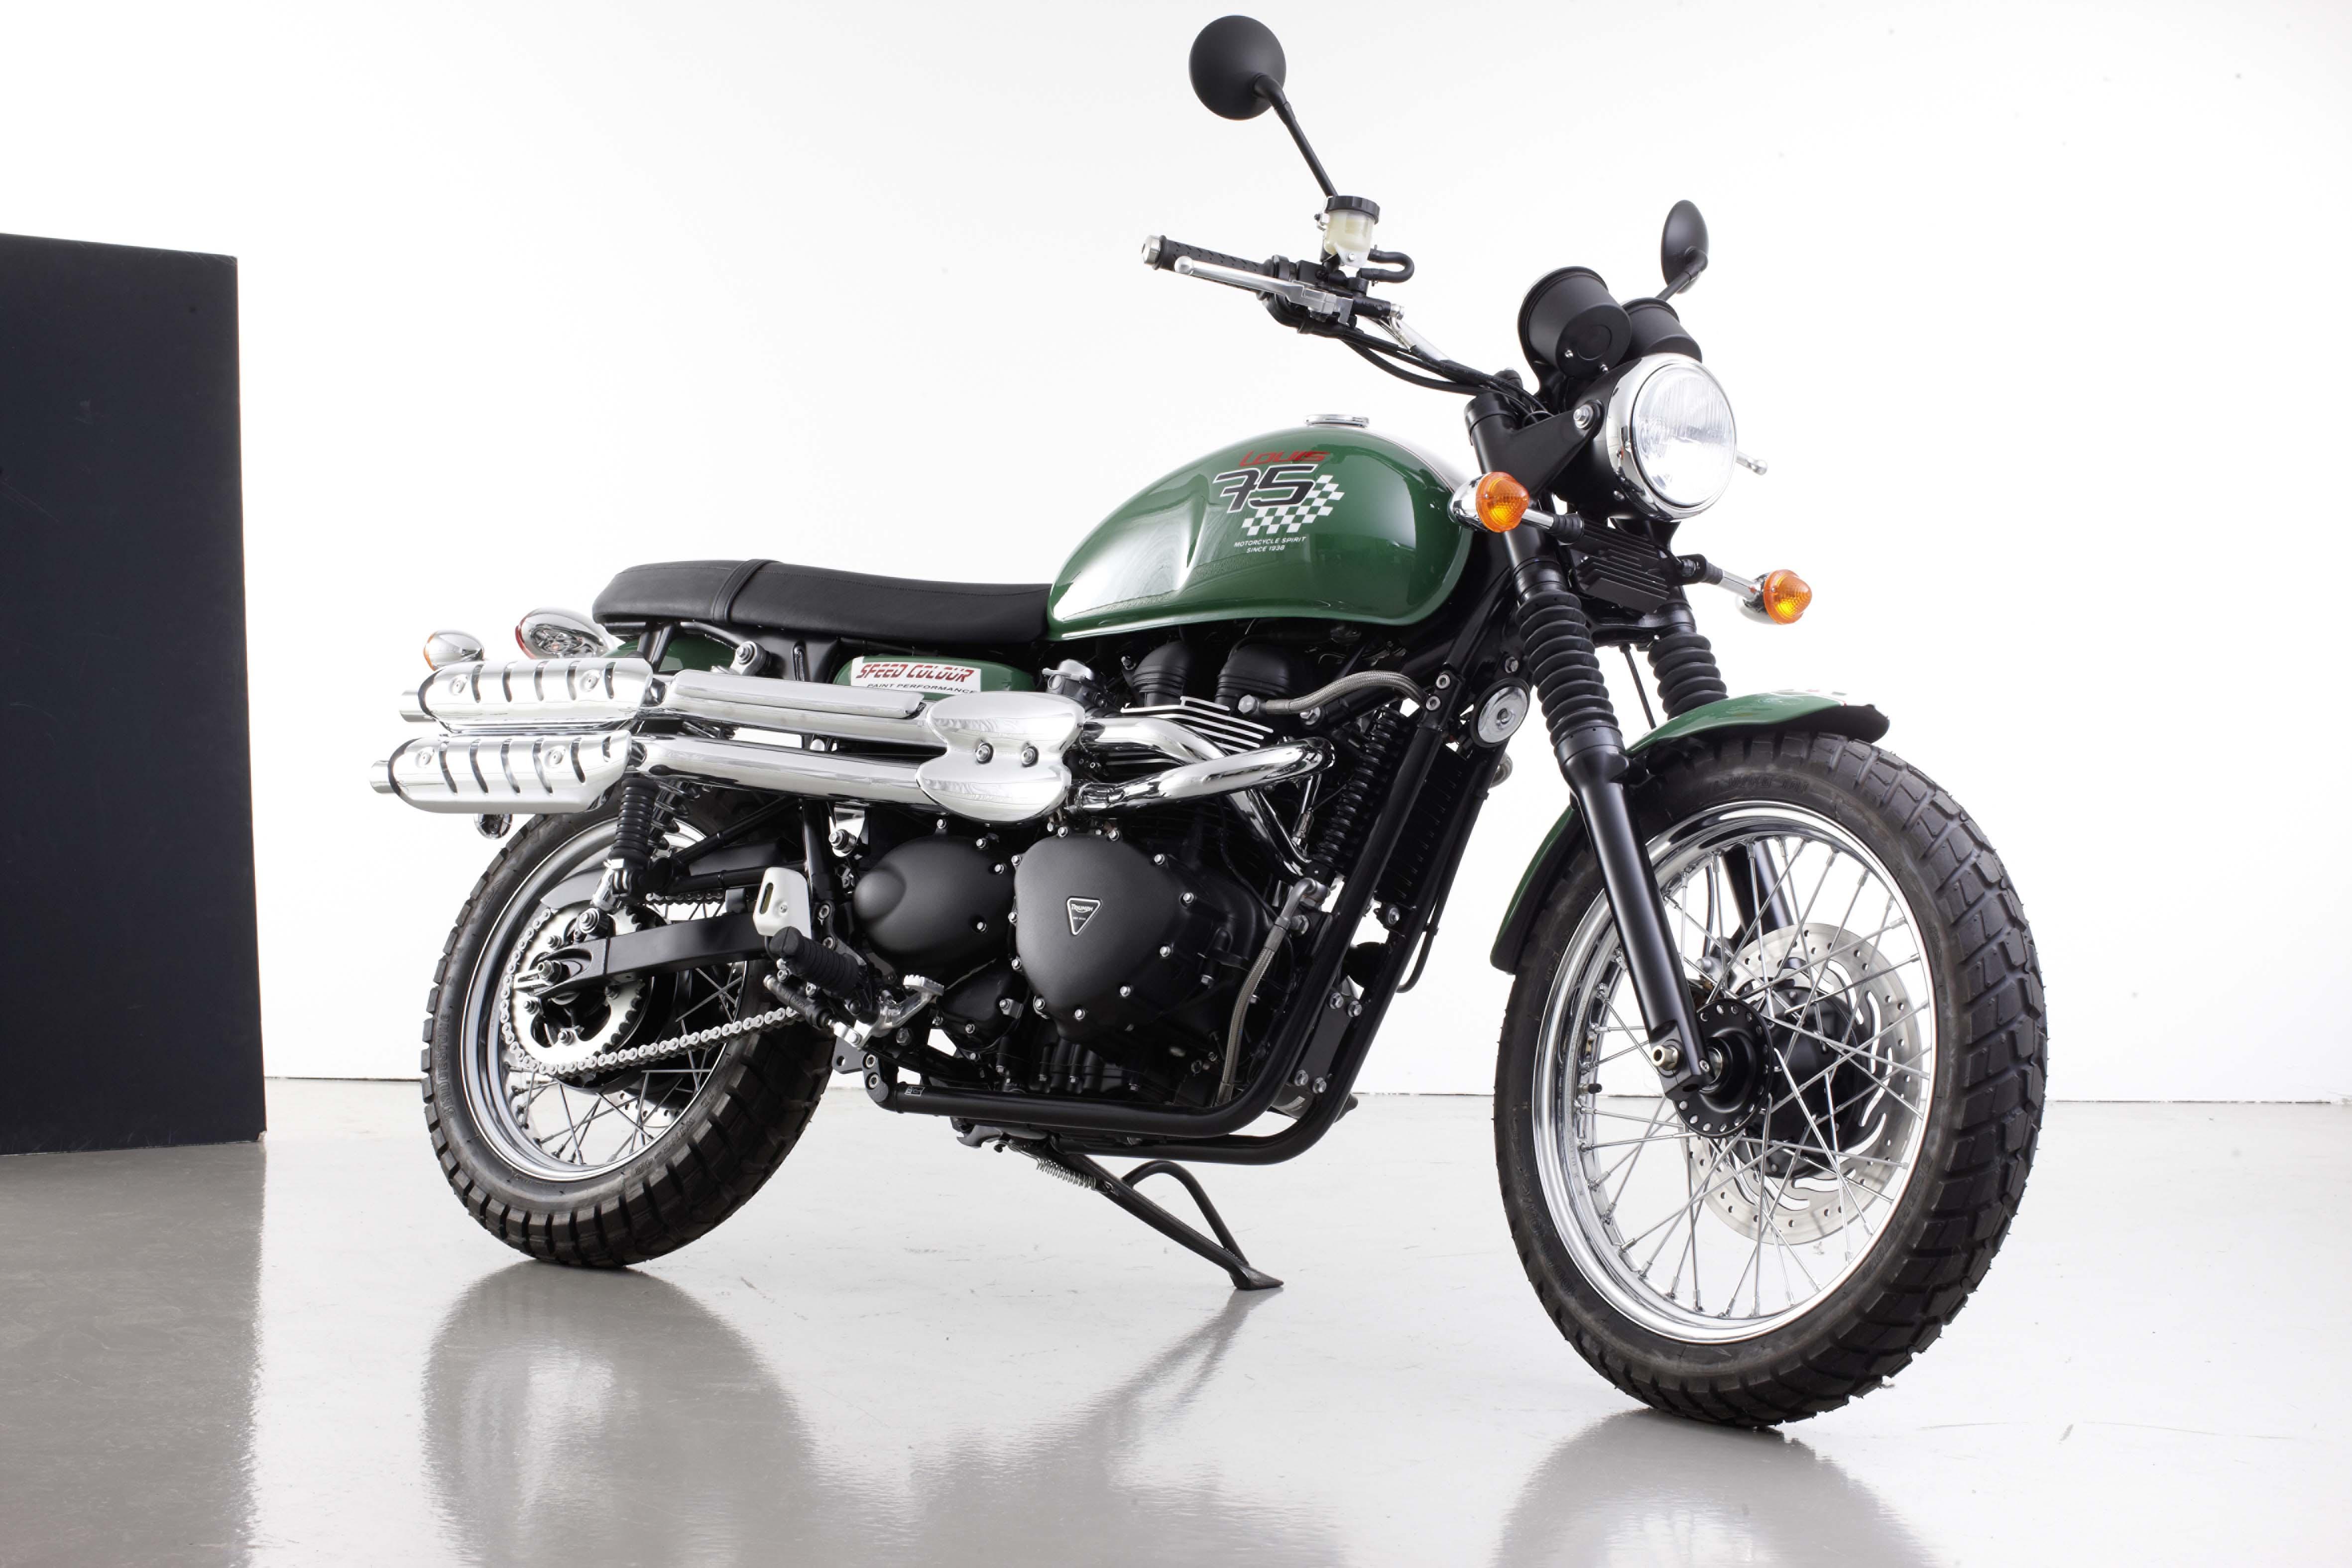 castrol bonneville und scrambler motorrad fotos motorrad. Black Bedroom Furniture Sets. Home Design Ideas